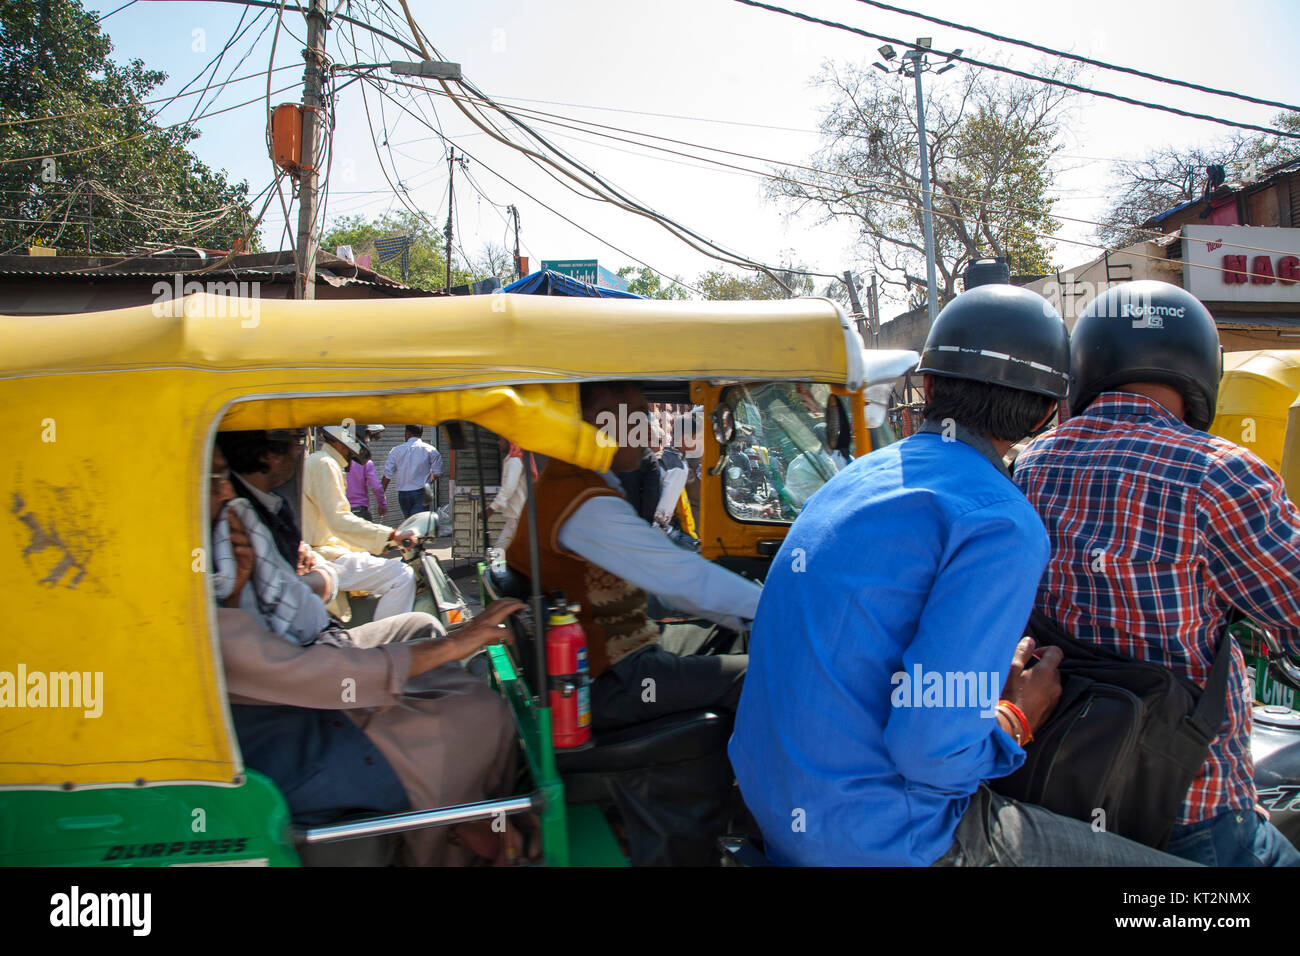 Traffic bajaj auto rickshaw in New Delhi, India - Stock Image